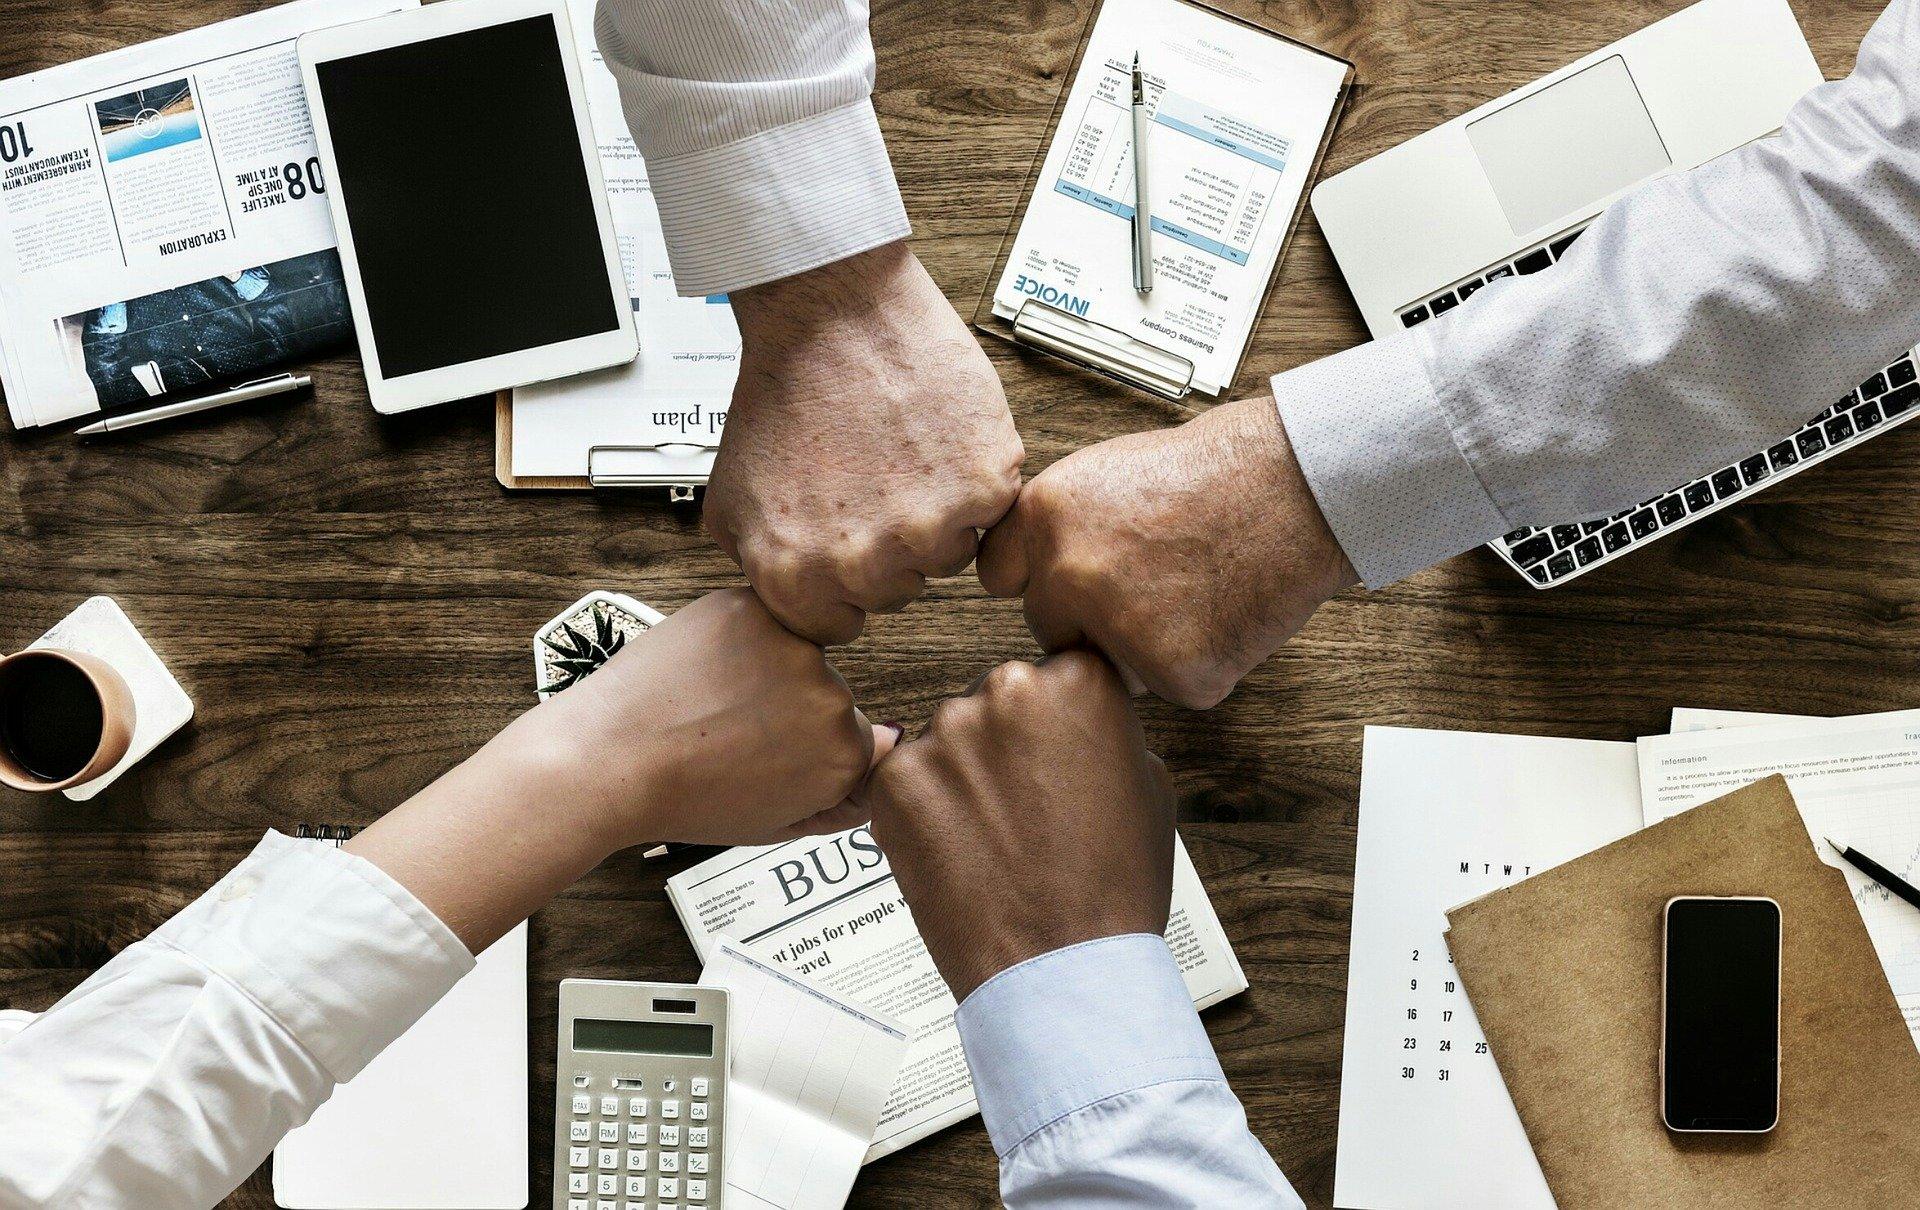 BtoB決済:掛売は請求代行サービスが効率的!その理由は?